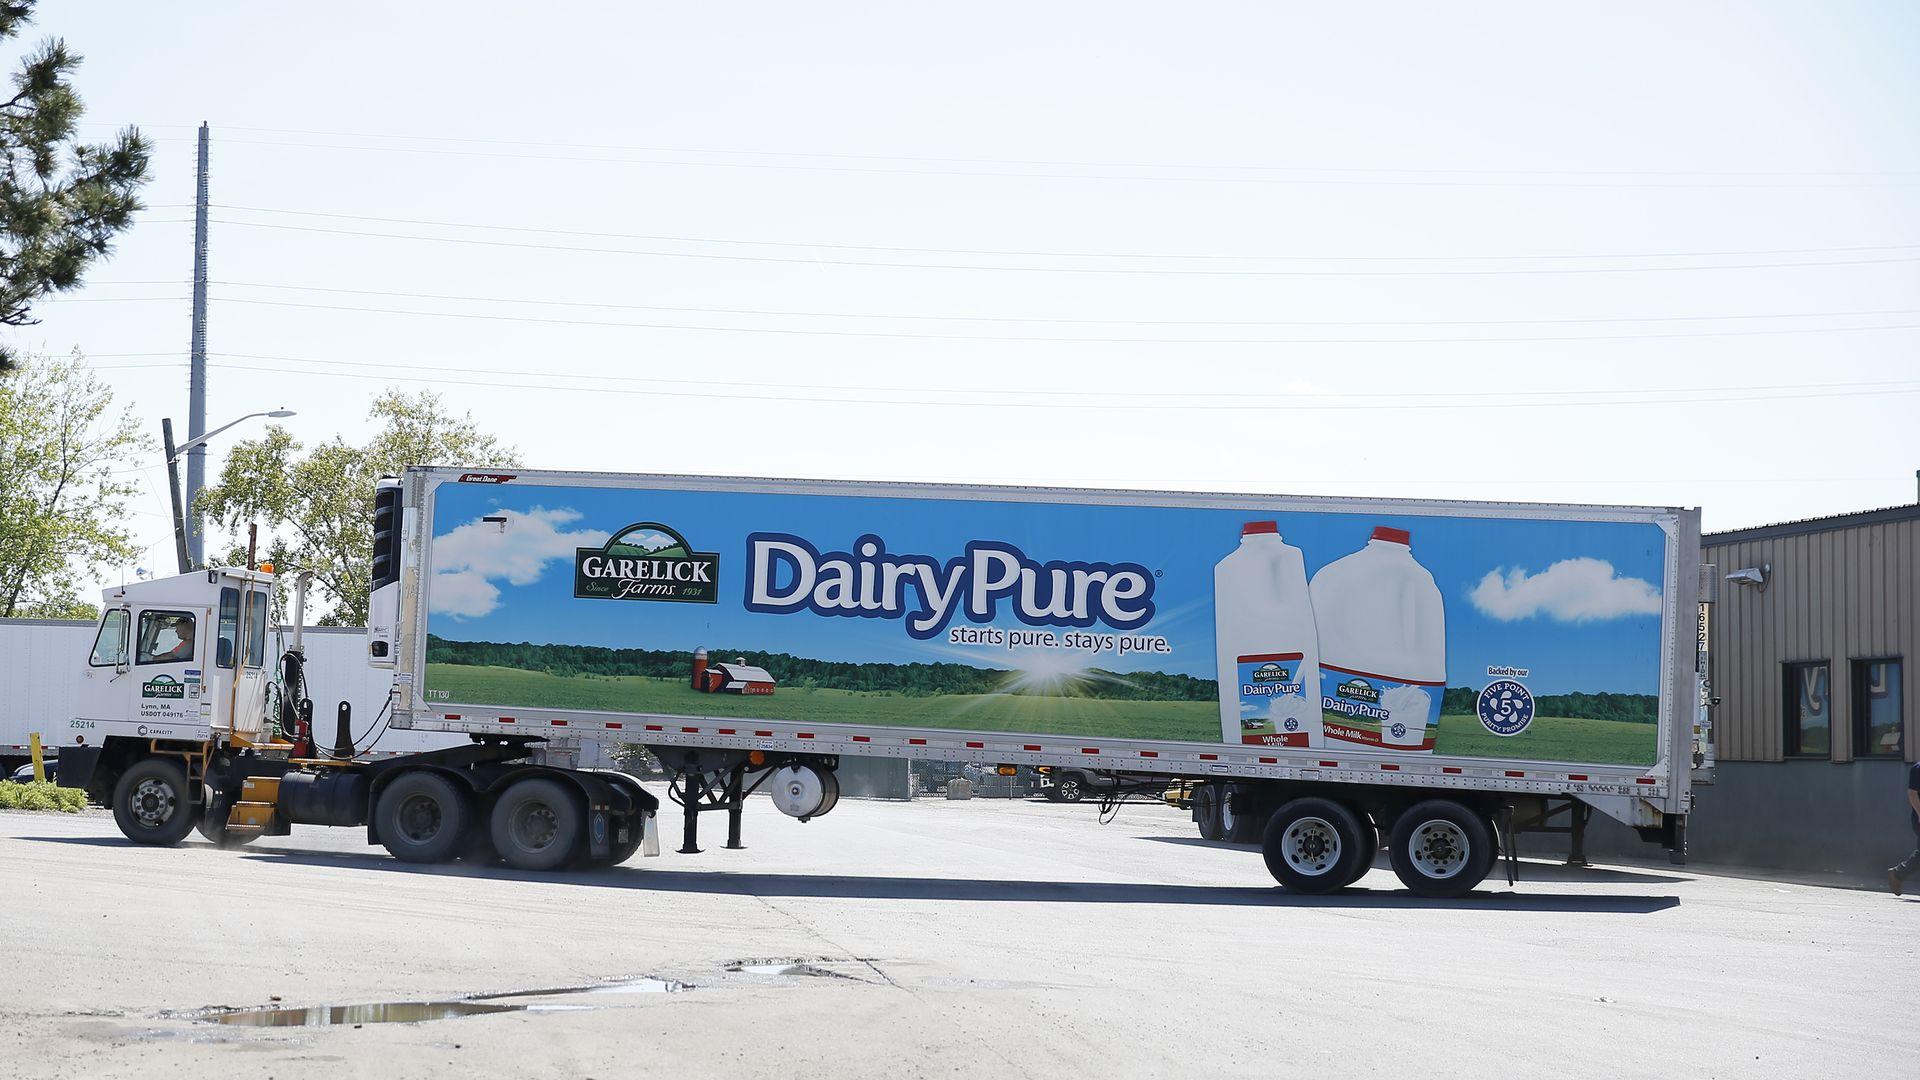 Dairy Pure milk truck